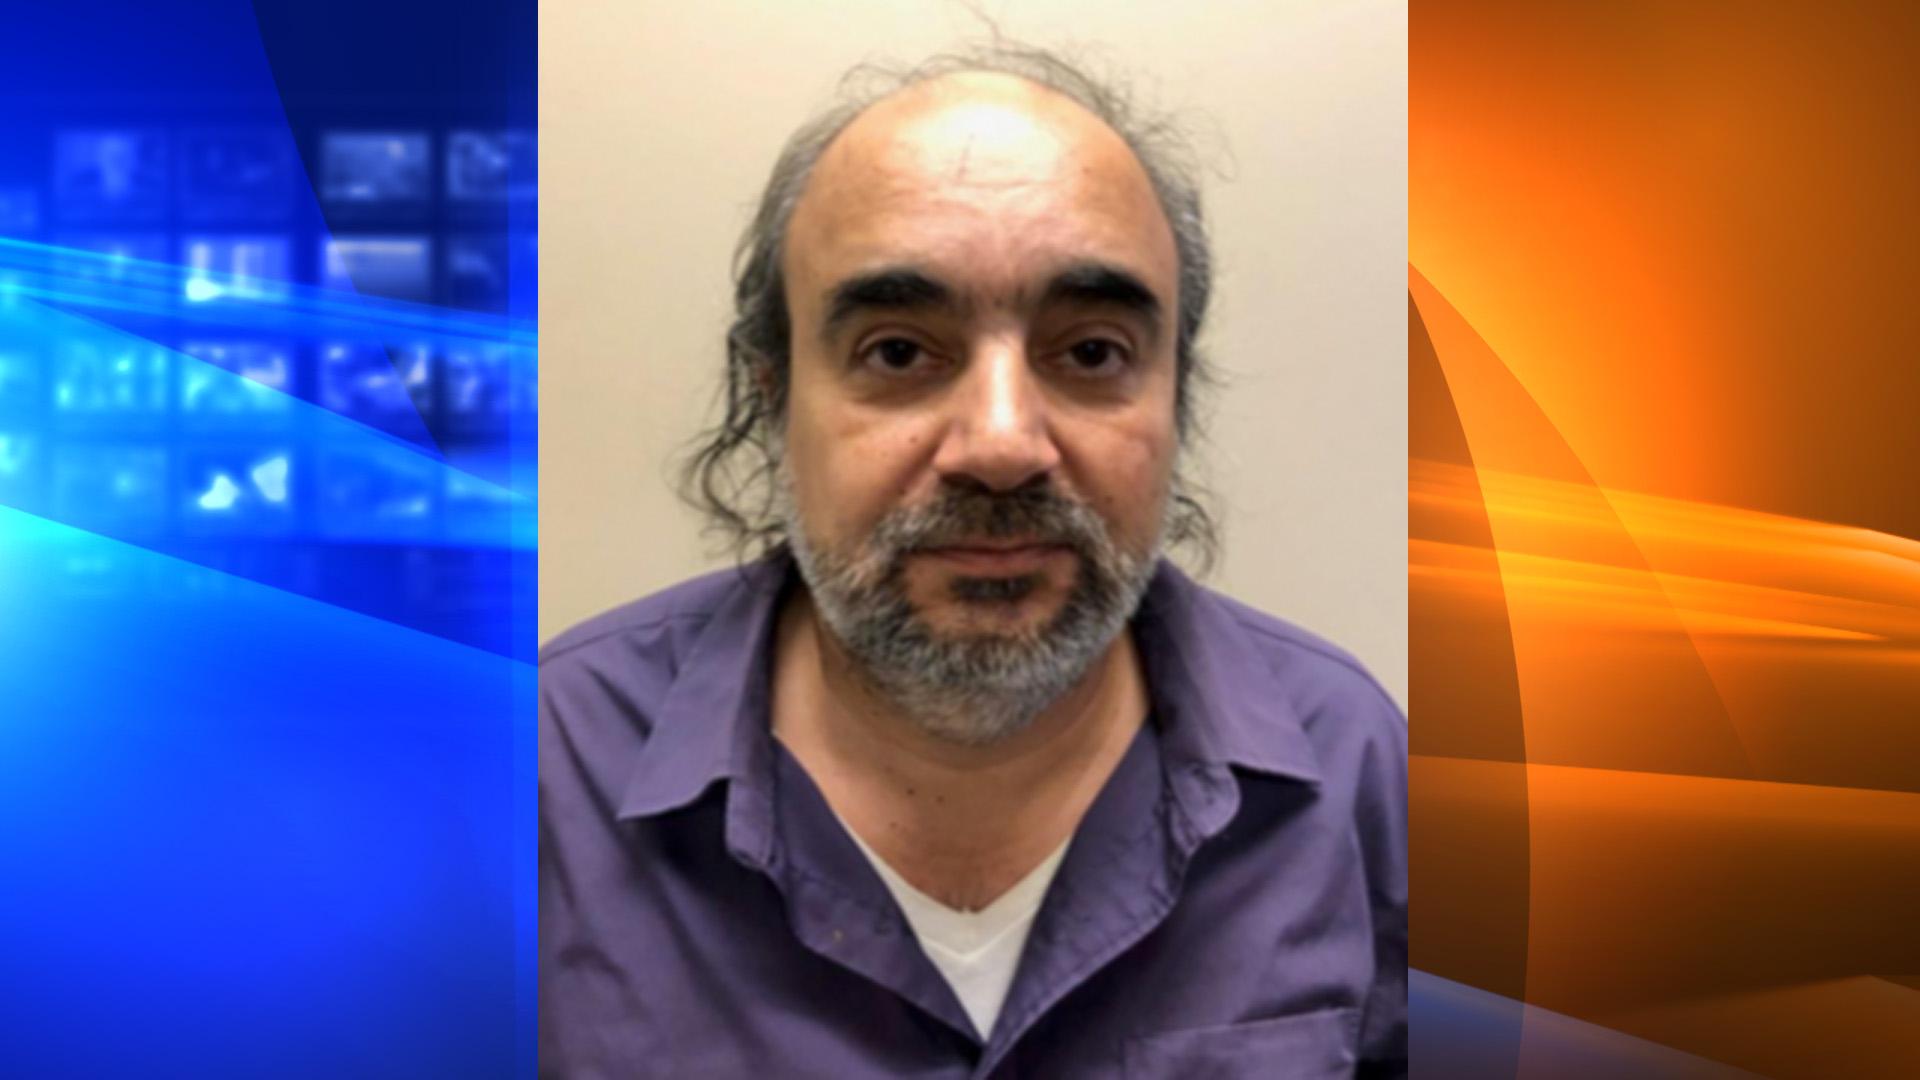 Hyder Mahdi Jaffer, 51, was arrested in Hemet on murder charges on Feb. 26, 2020. (Hemet Police Department)